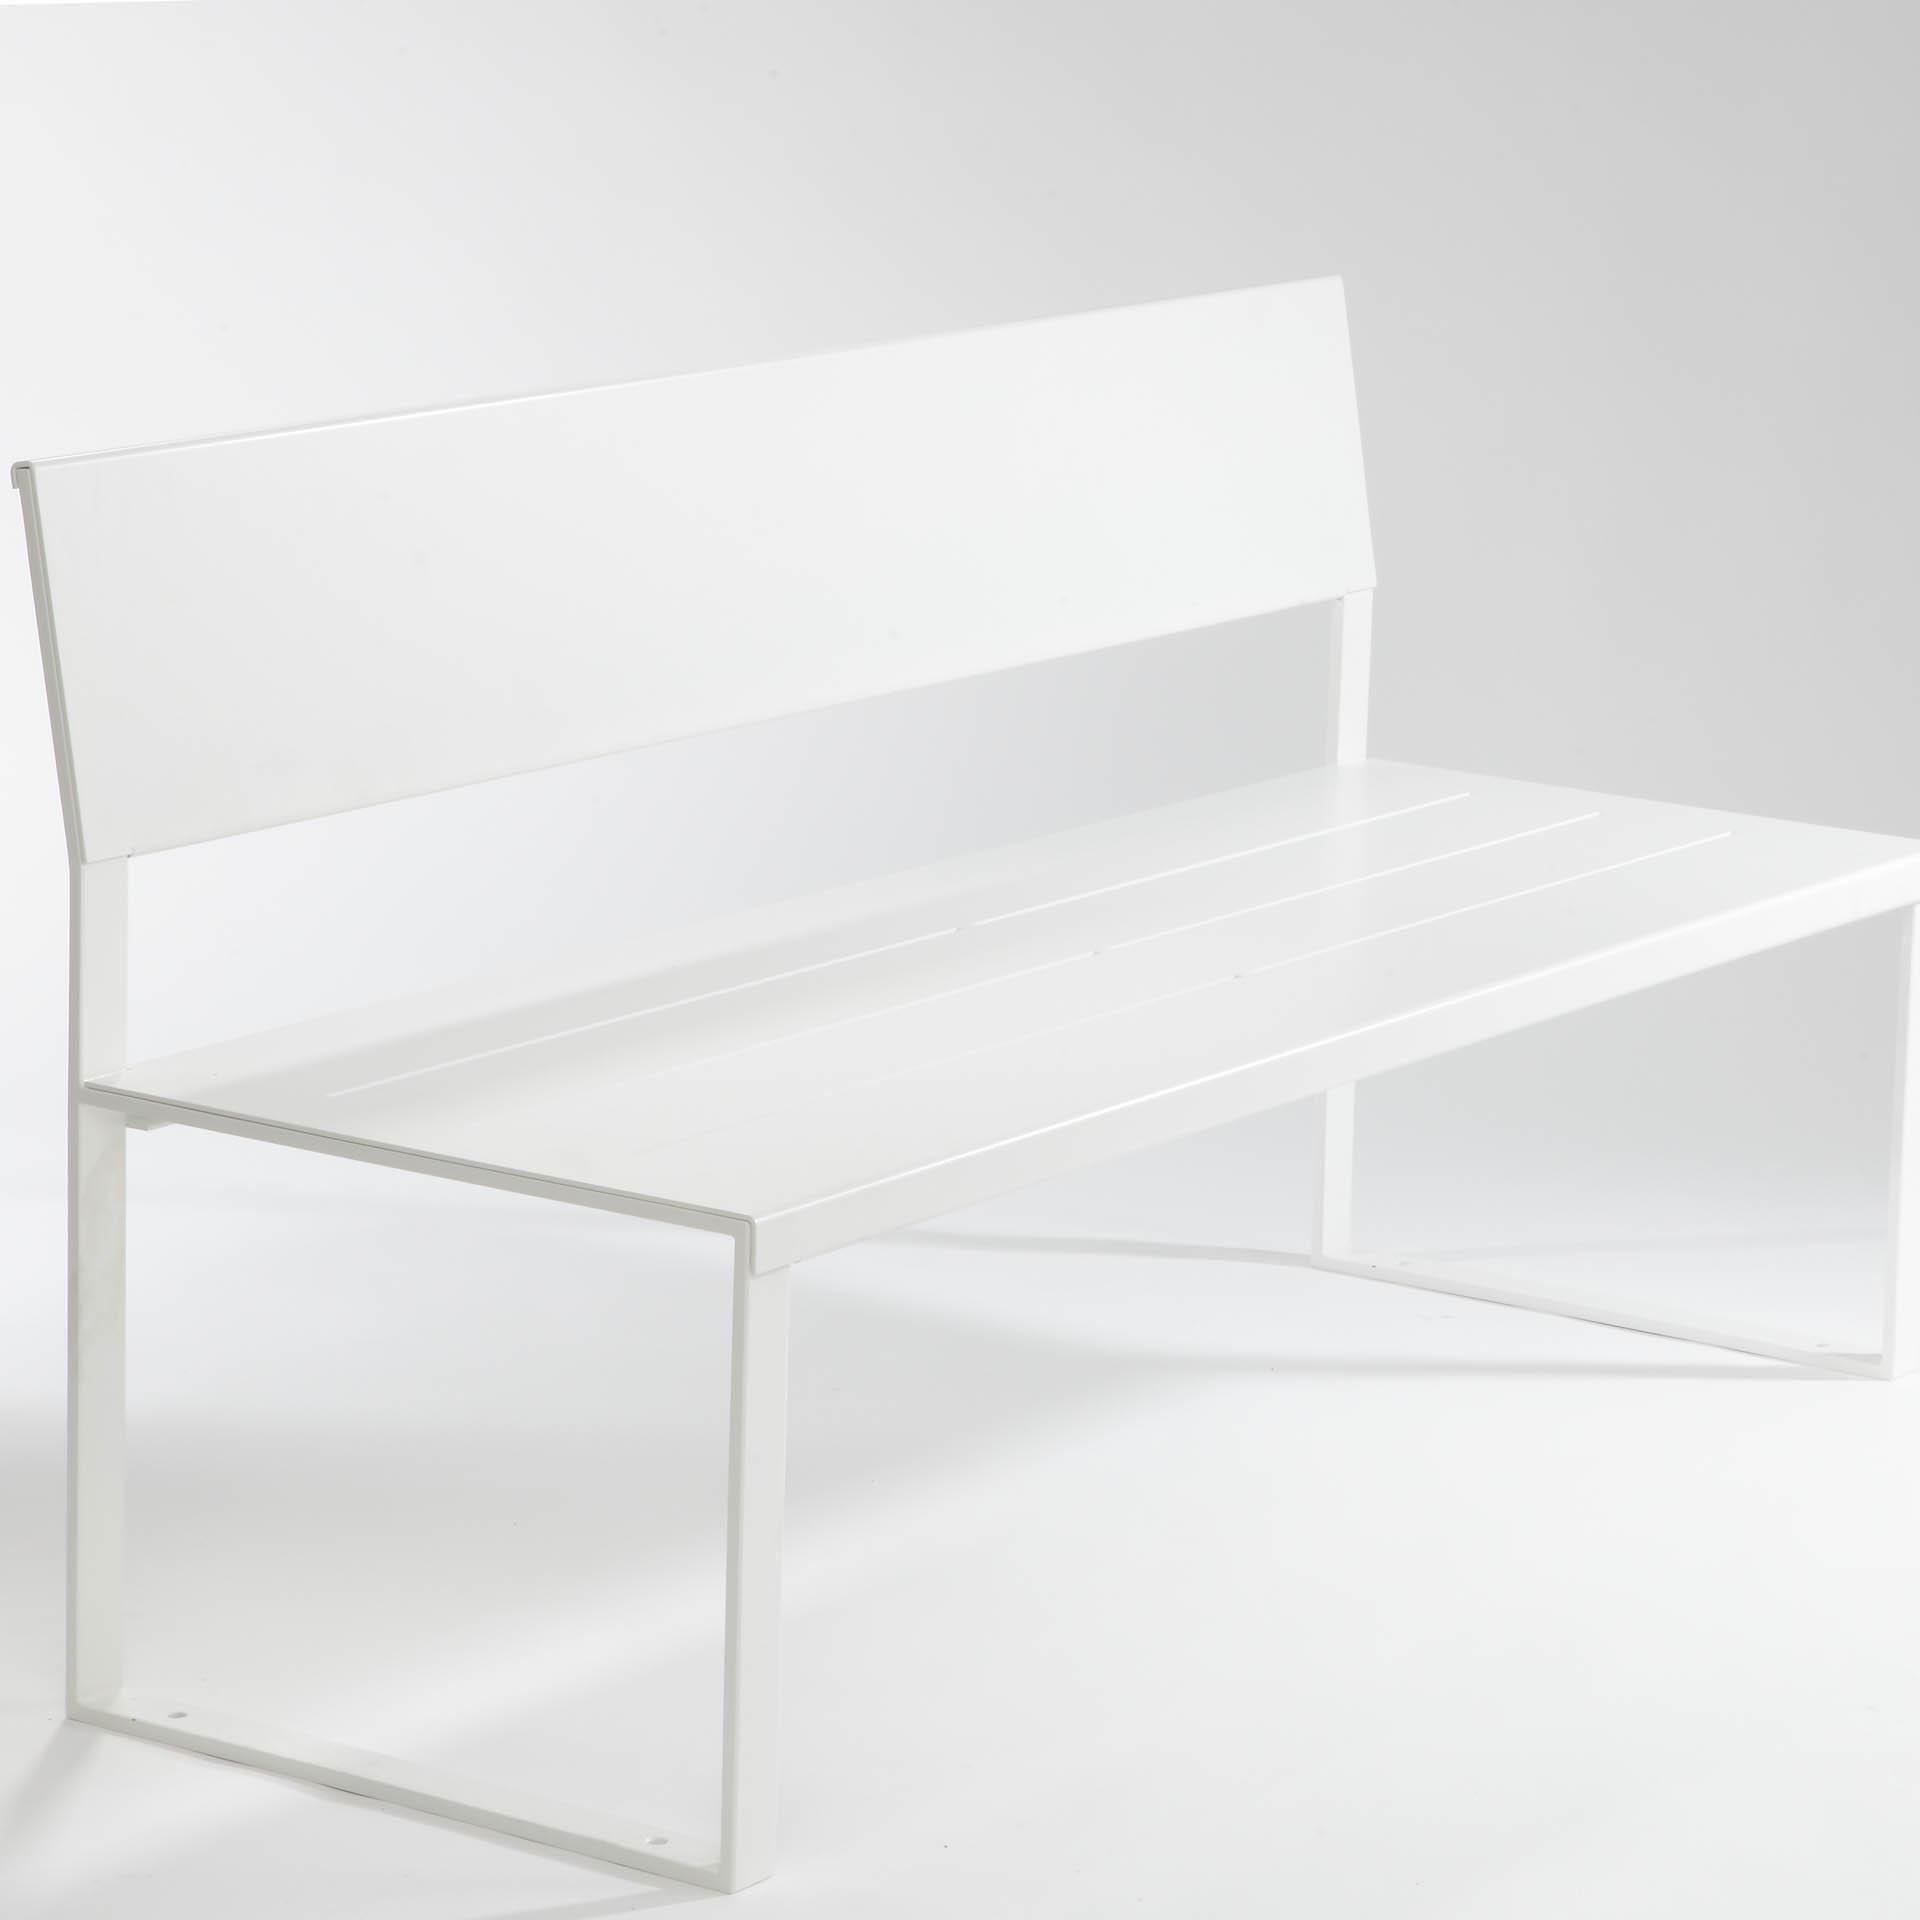 banc soft bench mobilier ext rieur en m tal. Black Bedroom Furniture Sets. Home Design Ideas